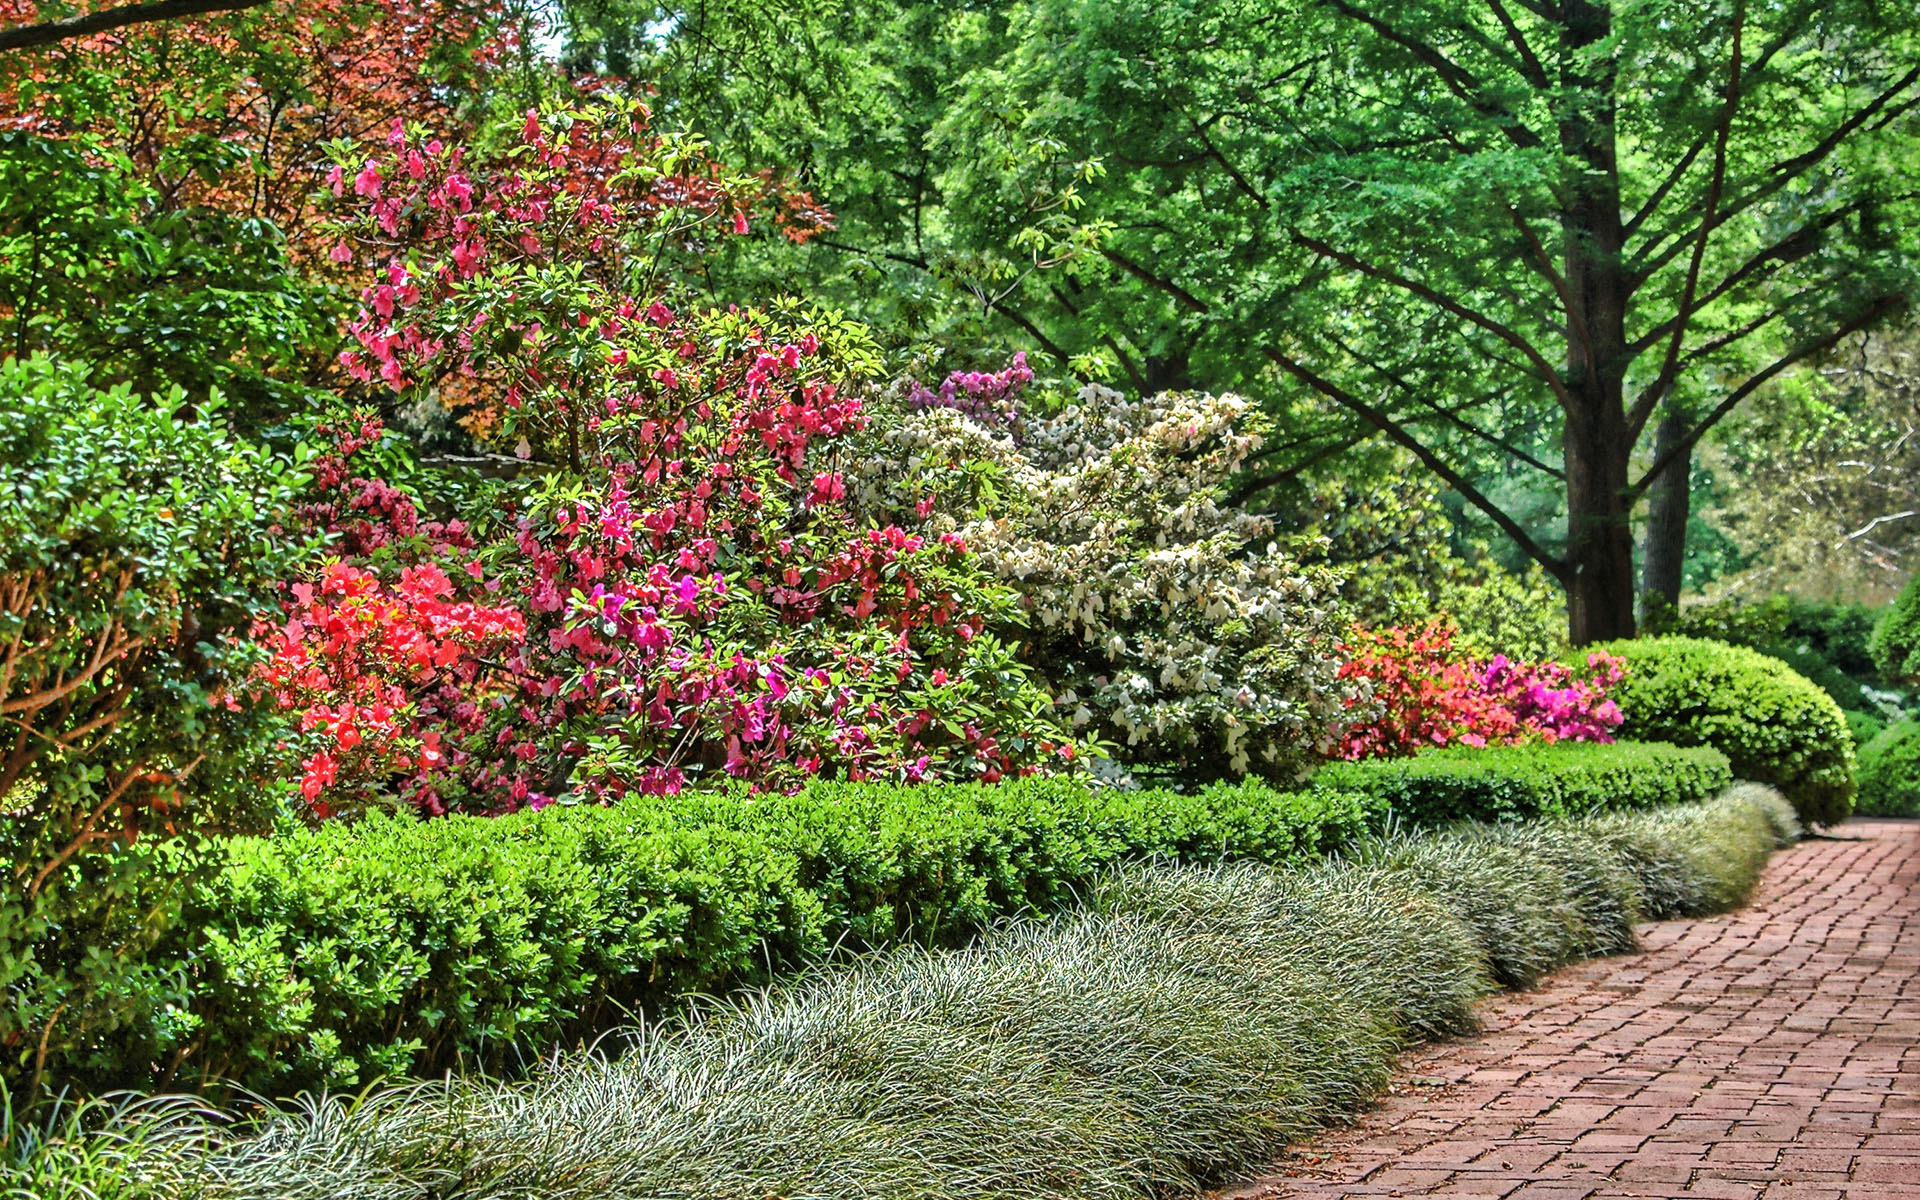 Galerie d inspiration jardin jardinerie dalhem li ge for Ecran de jardin belgique